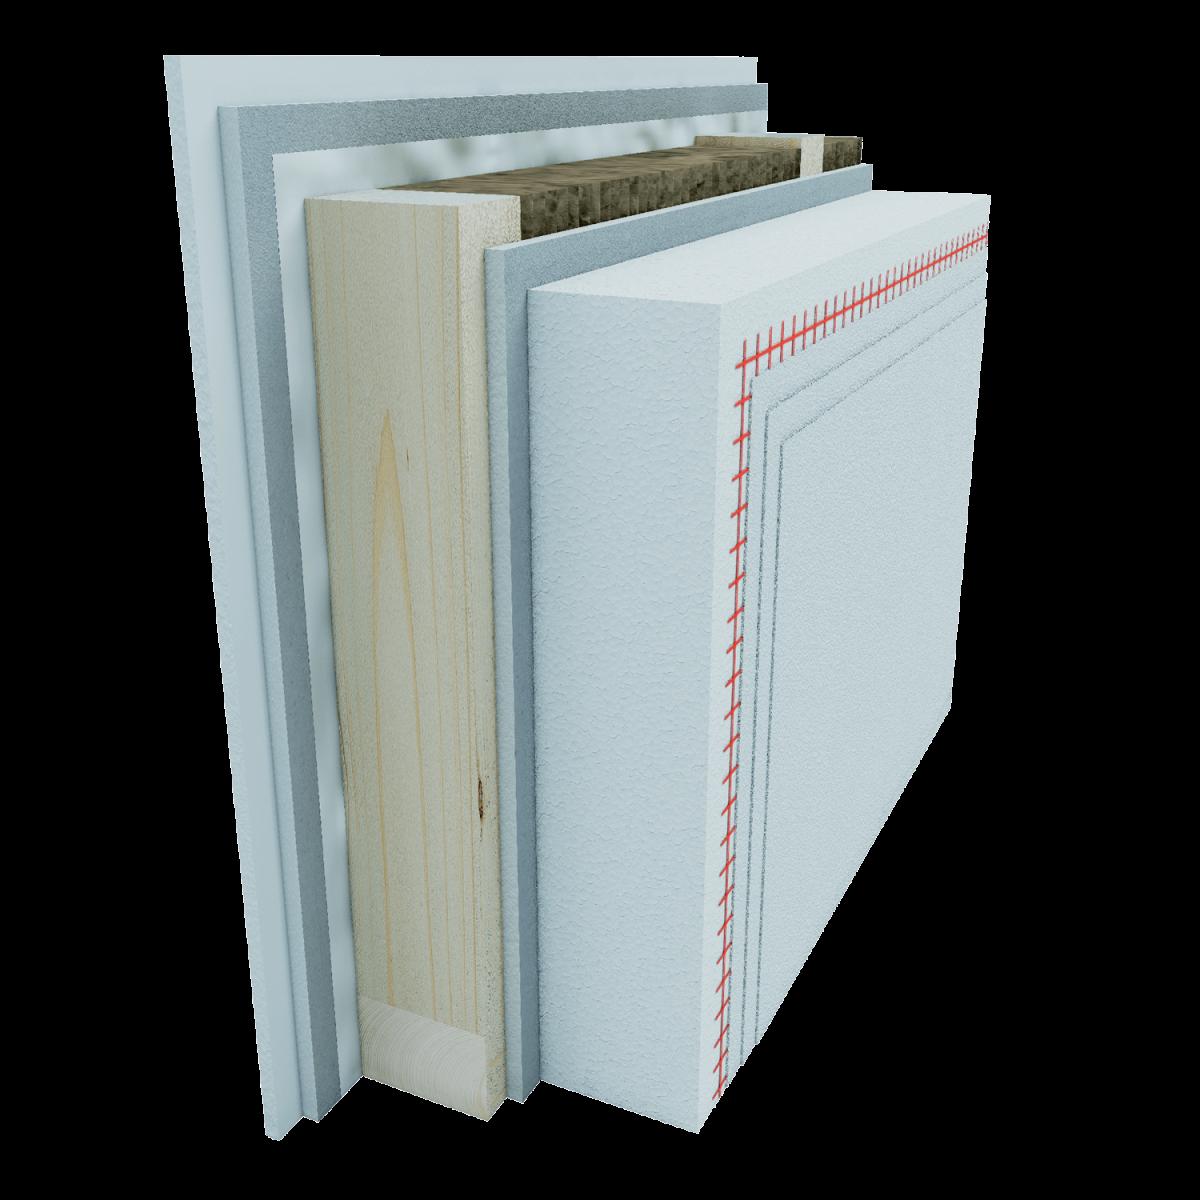 Rihter-konstrukcijski-sistemi-standard